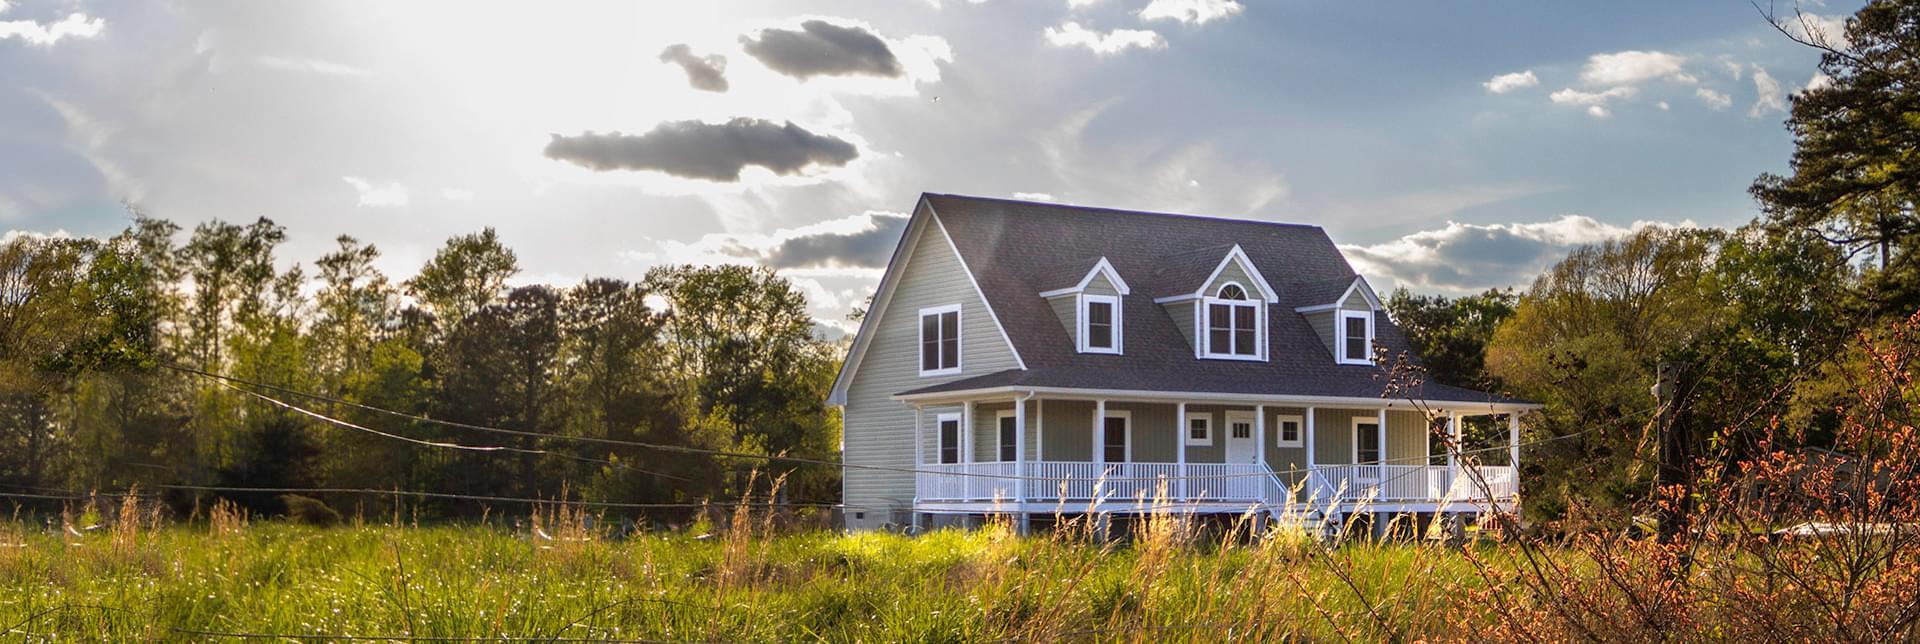 New Homes in Fredericksburg VA